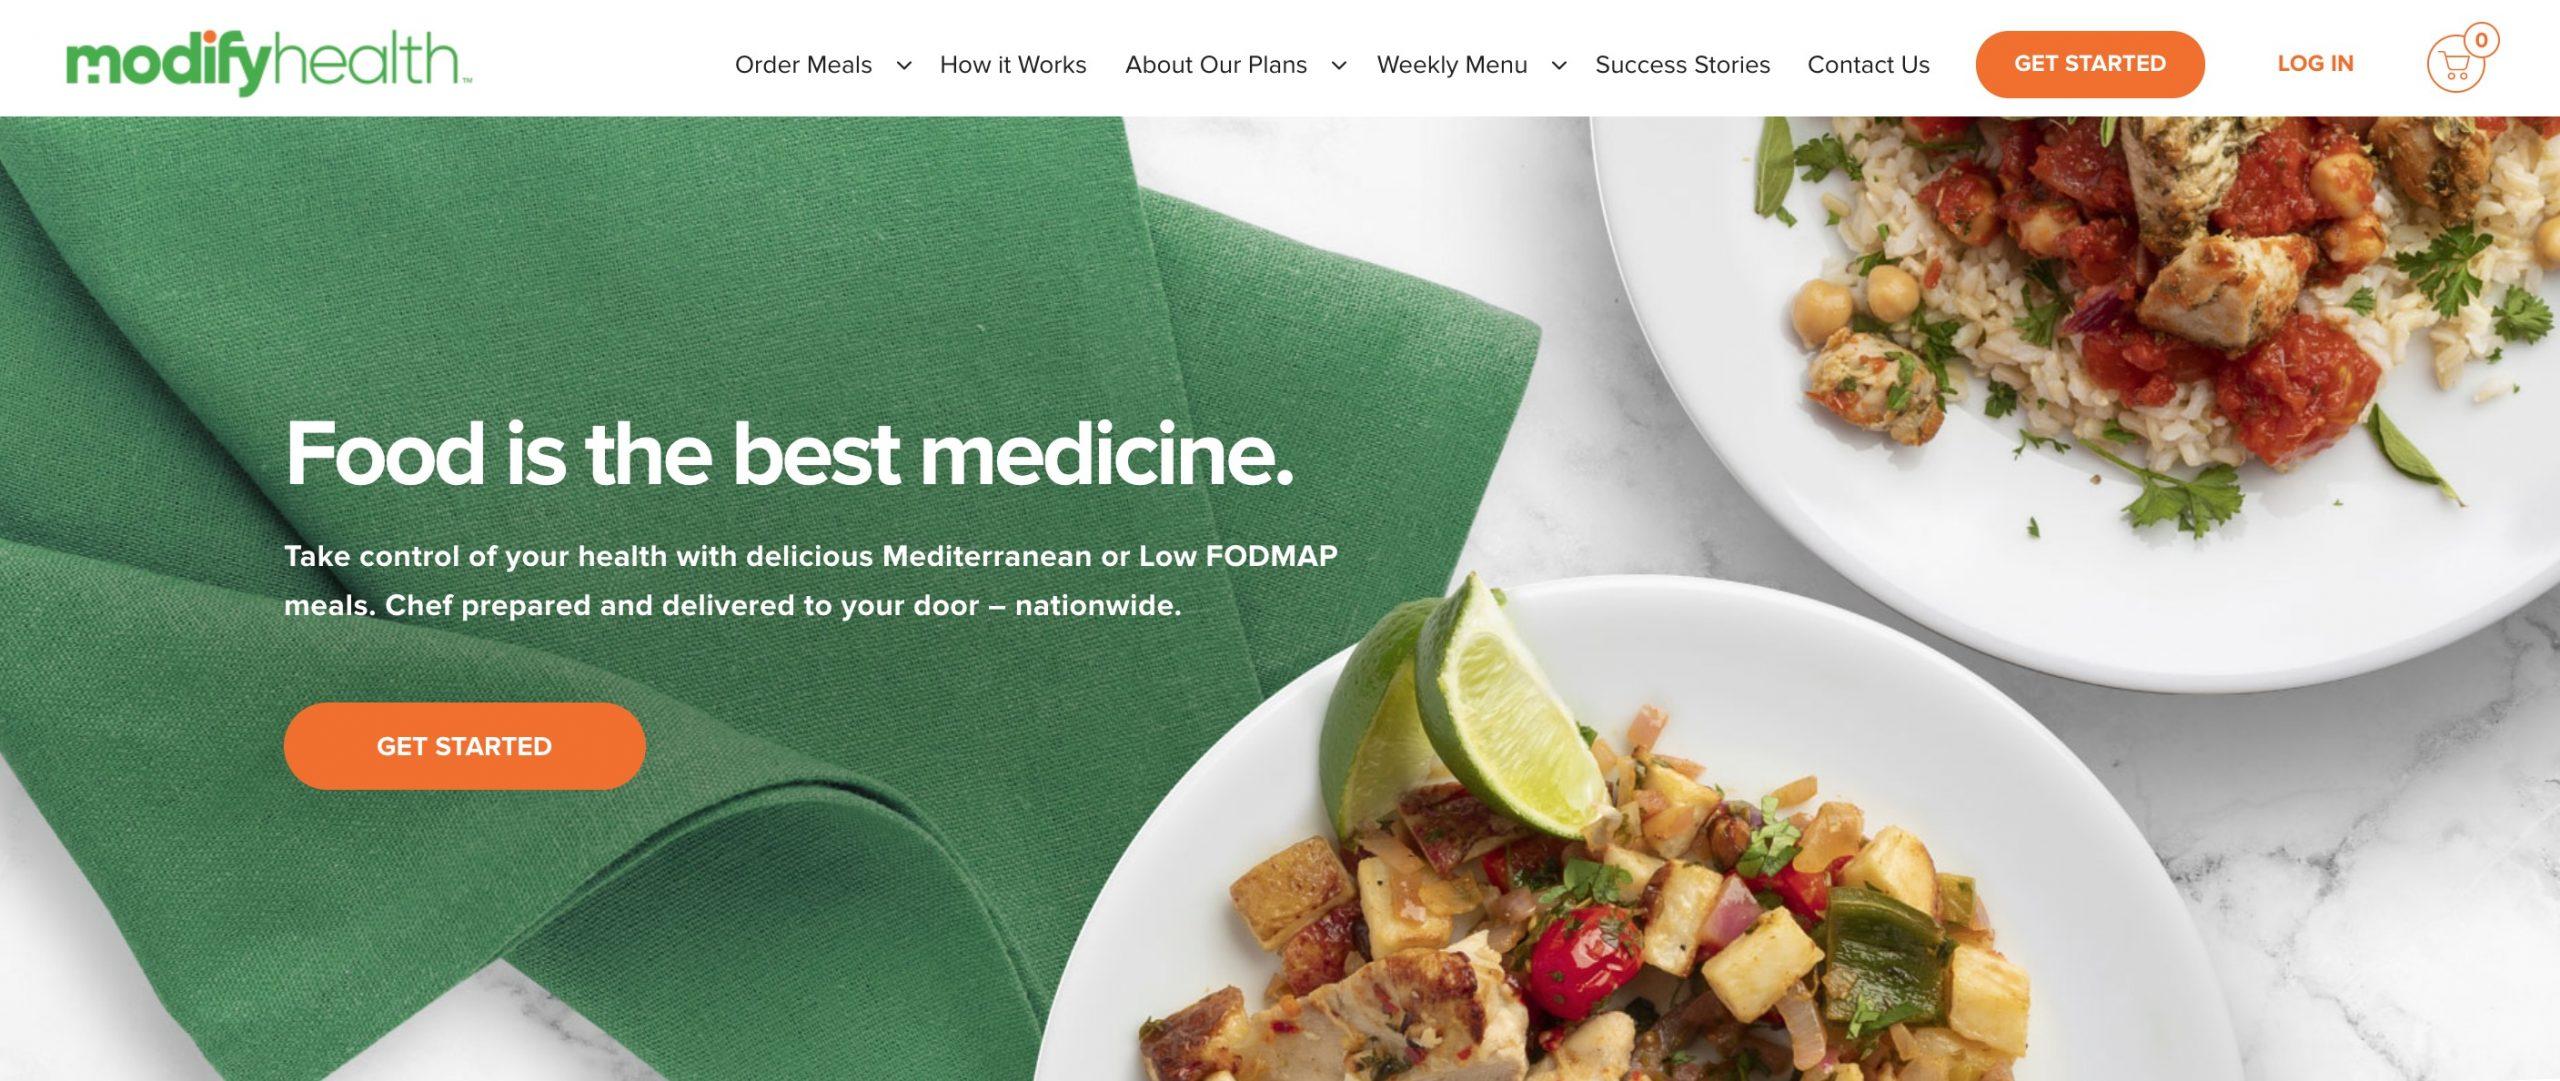 Modify Health main page